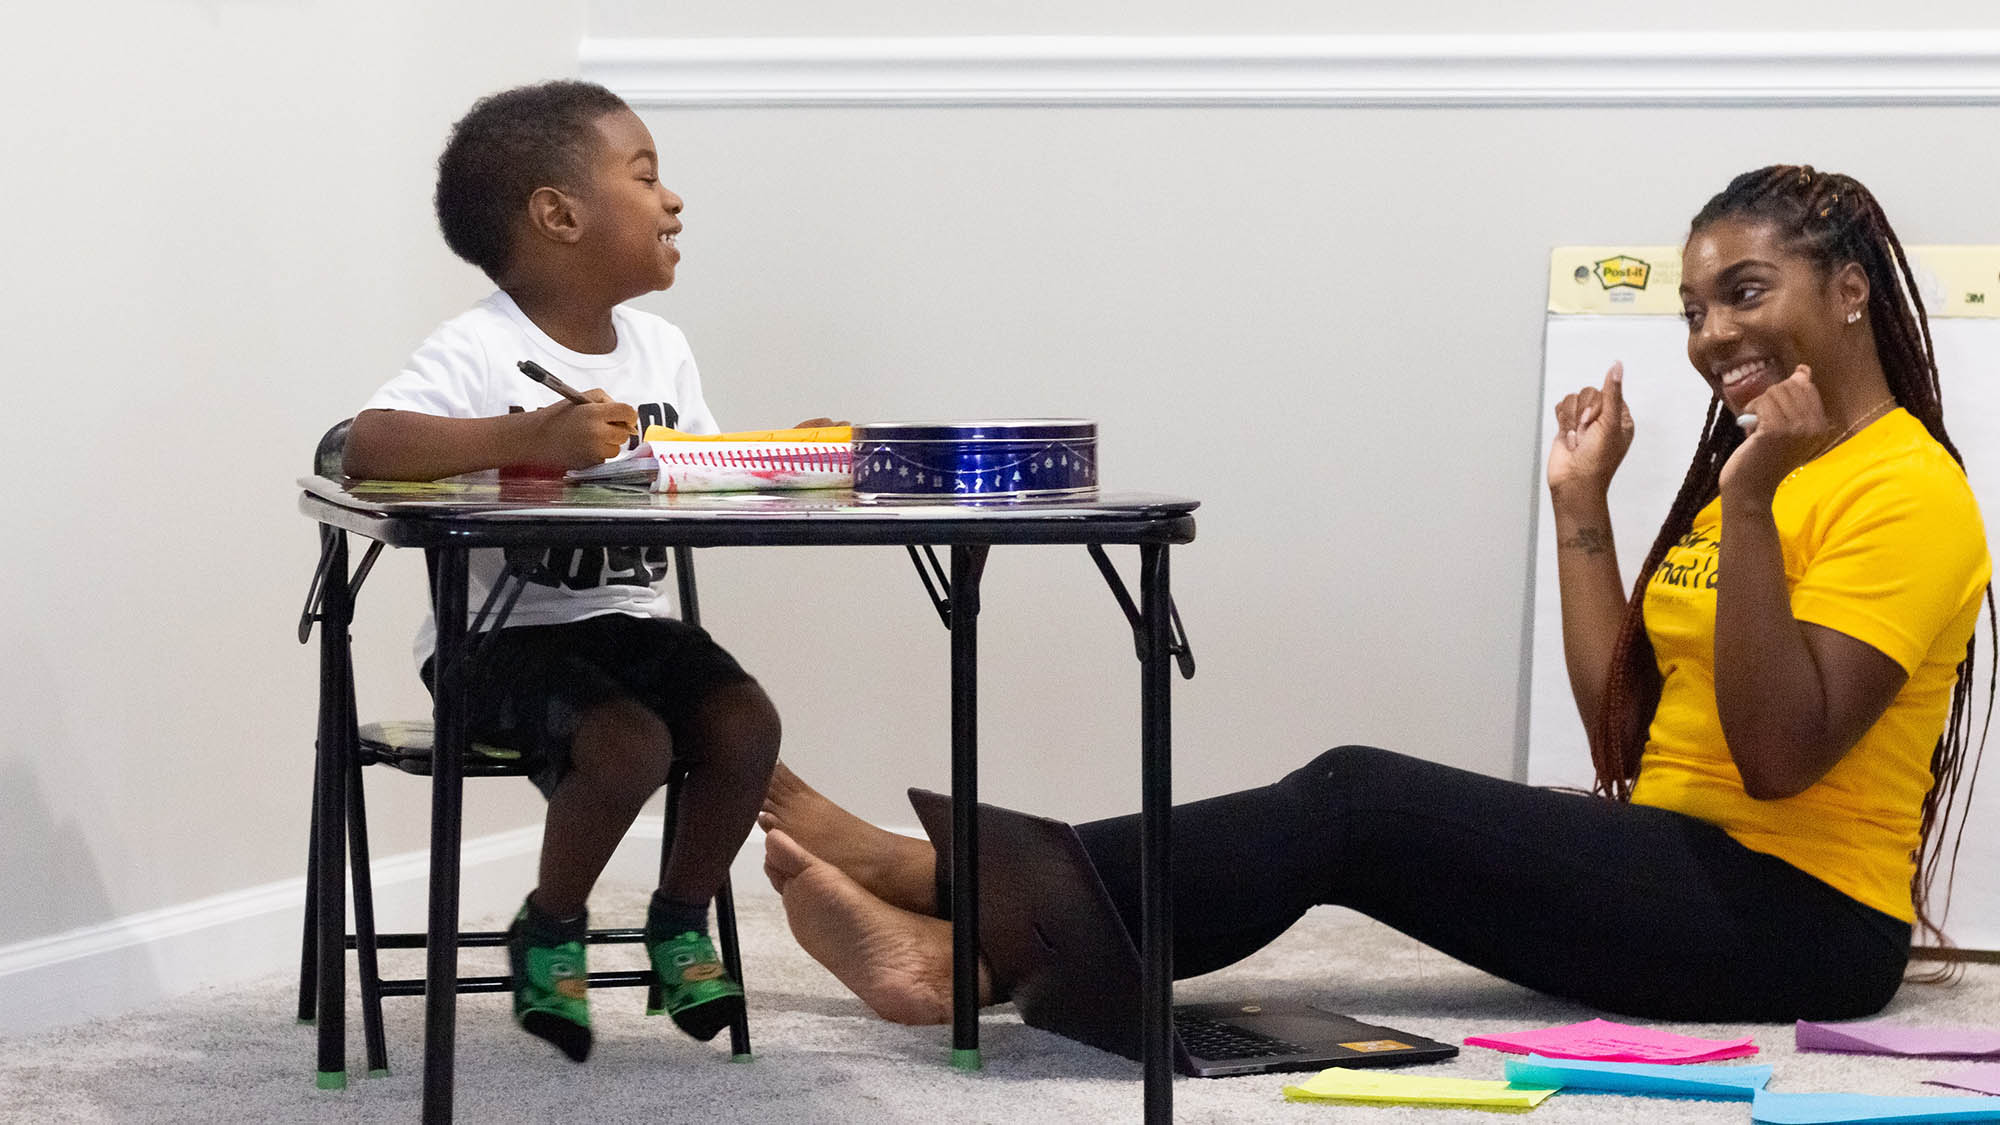 Black boy at table looking down at female Black teacher sitting on floor